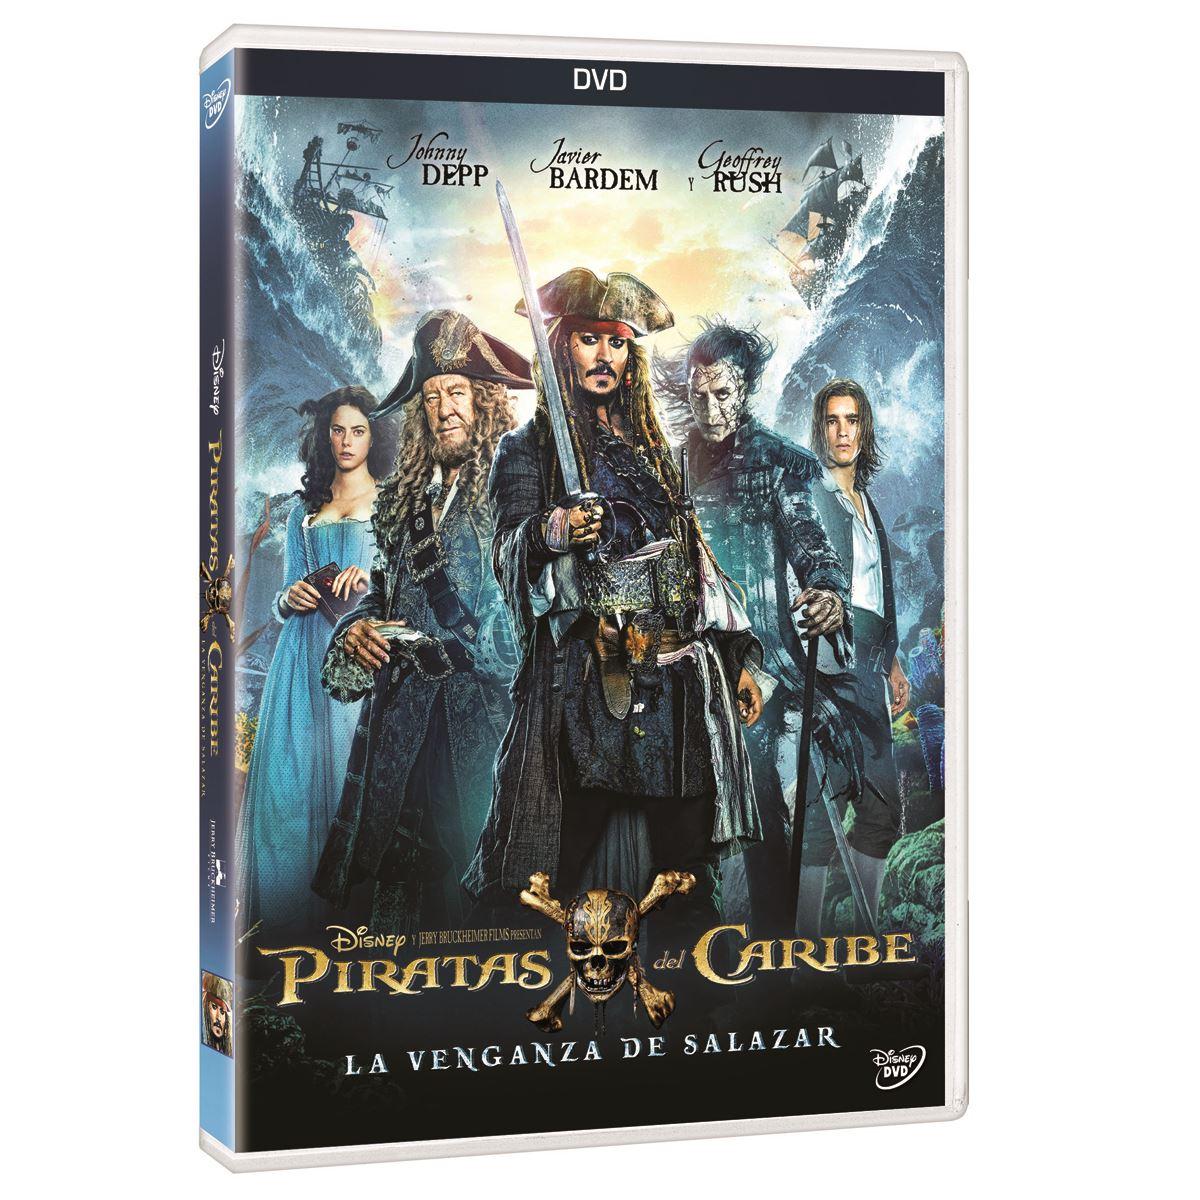 DVD Piratas del Caribe 5: La Venganza de Salazar